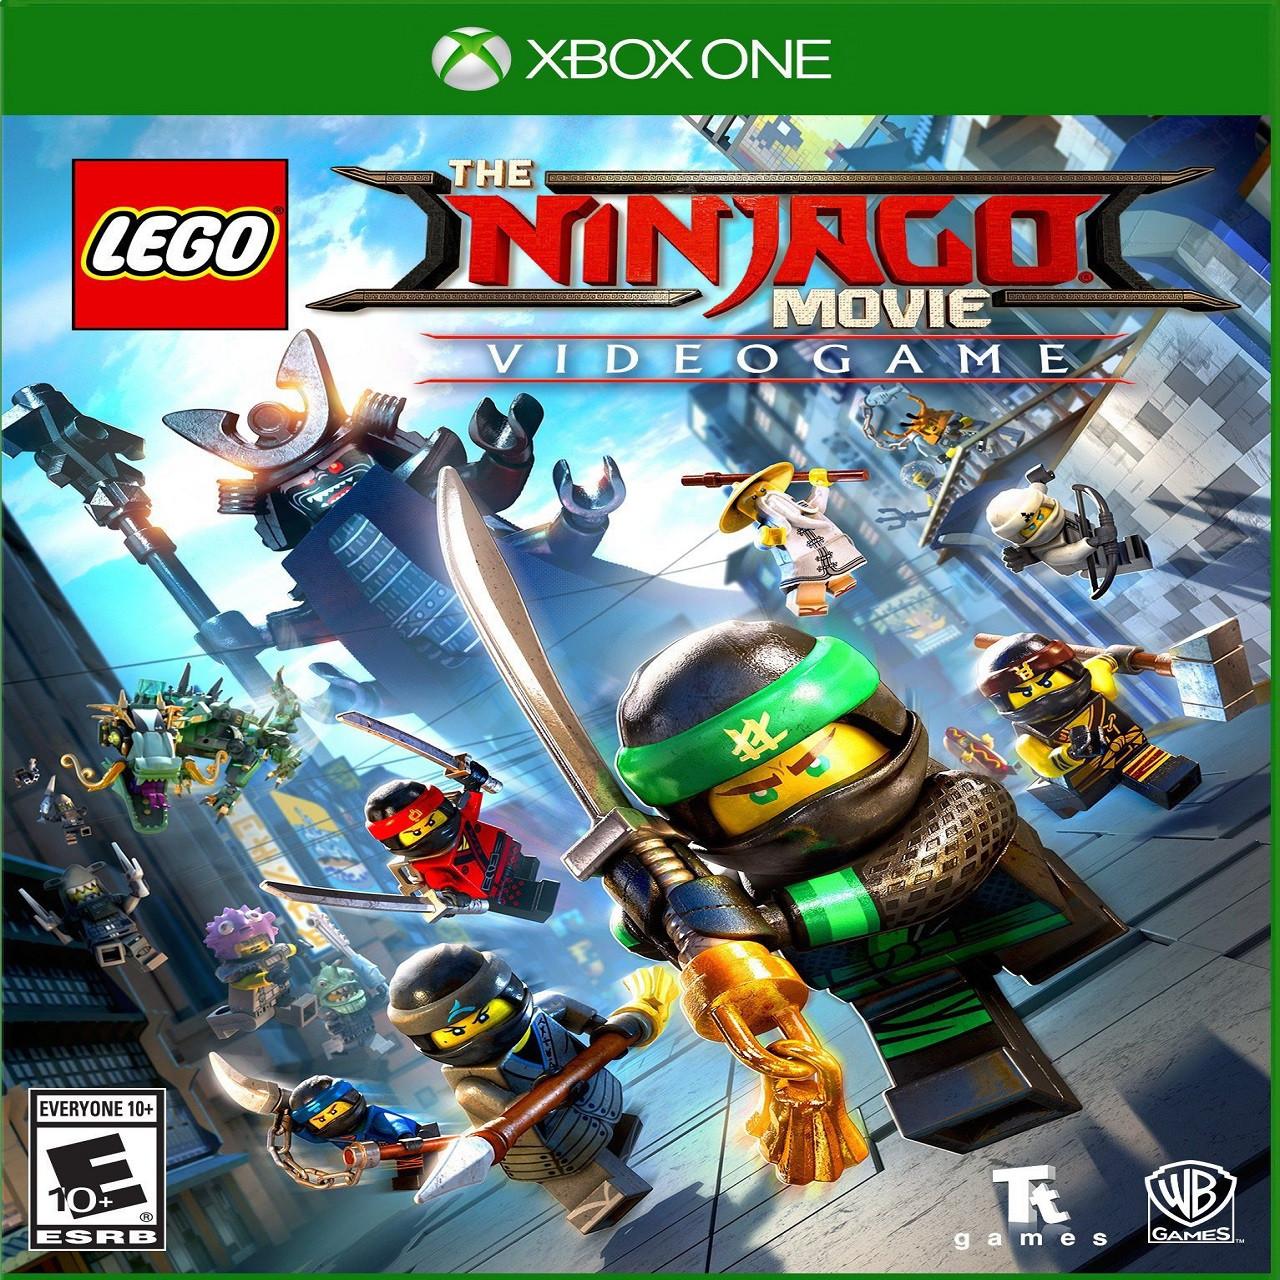 Lego Ninjago Movie Videogame SUB Xbox One